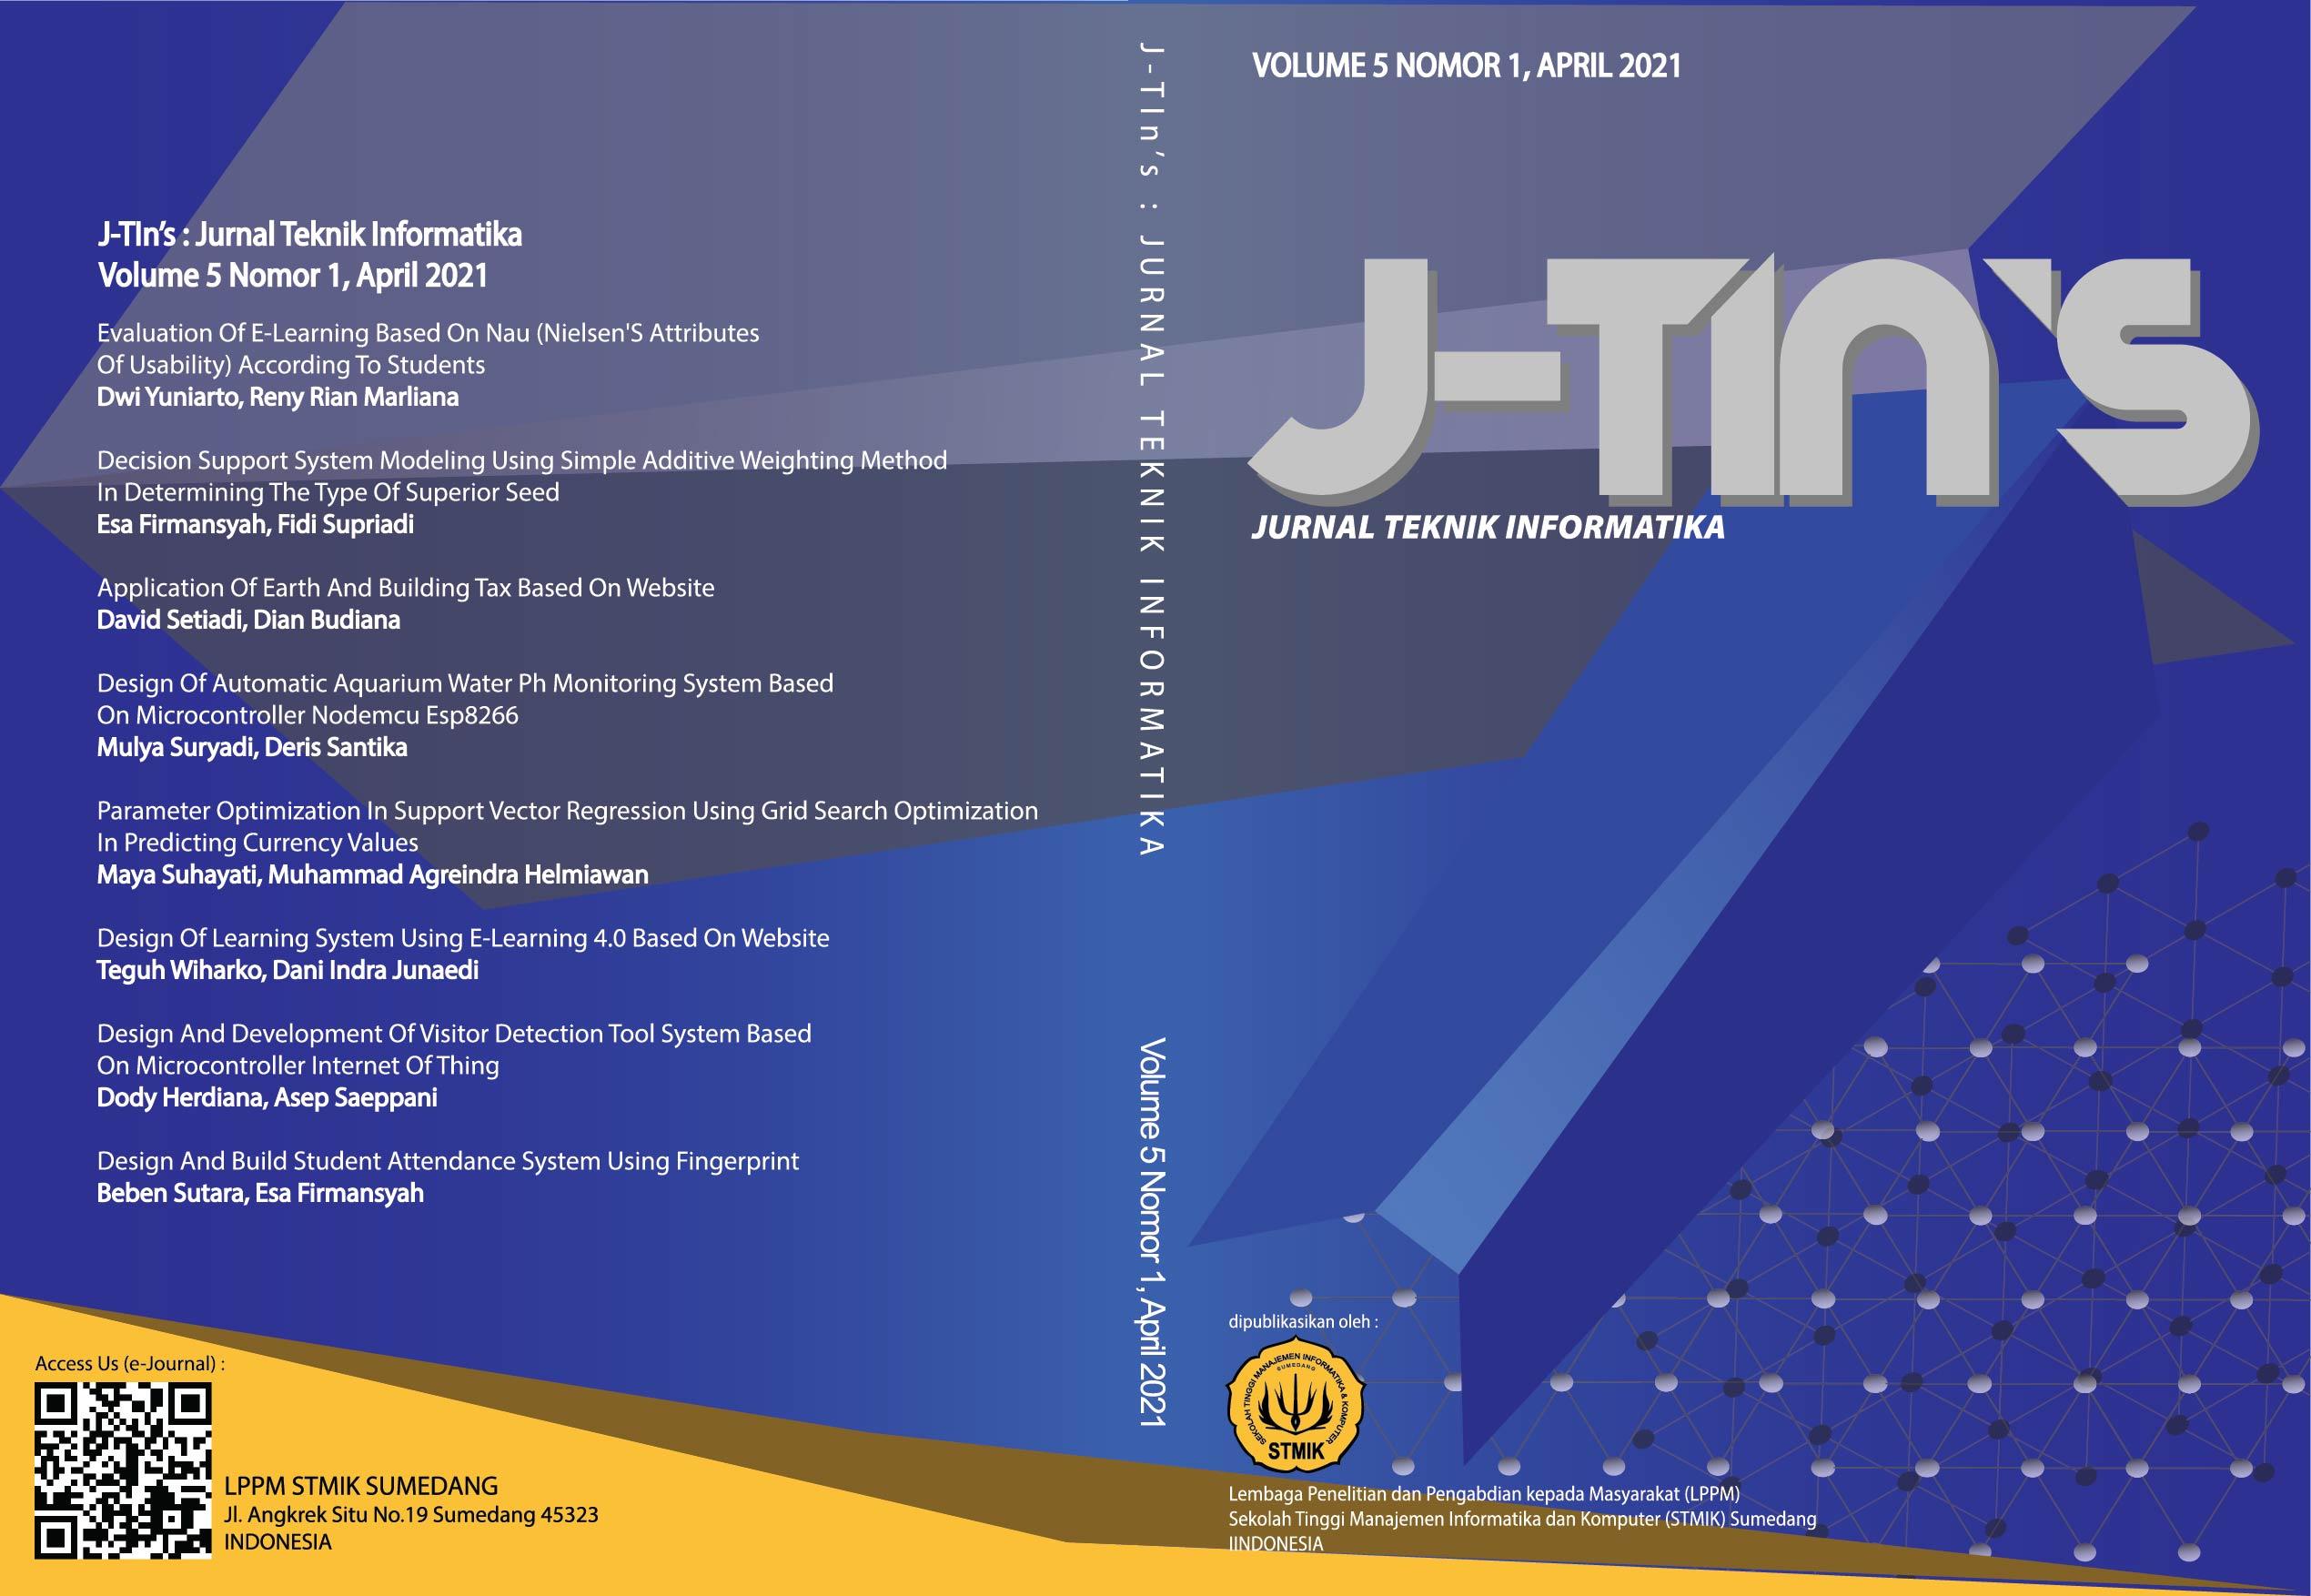 View Vol. 5 No. 1 (2021): J-Tin's